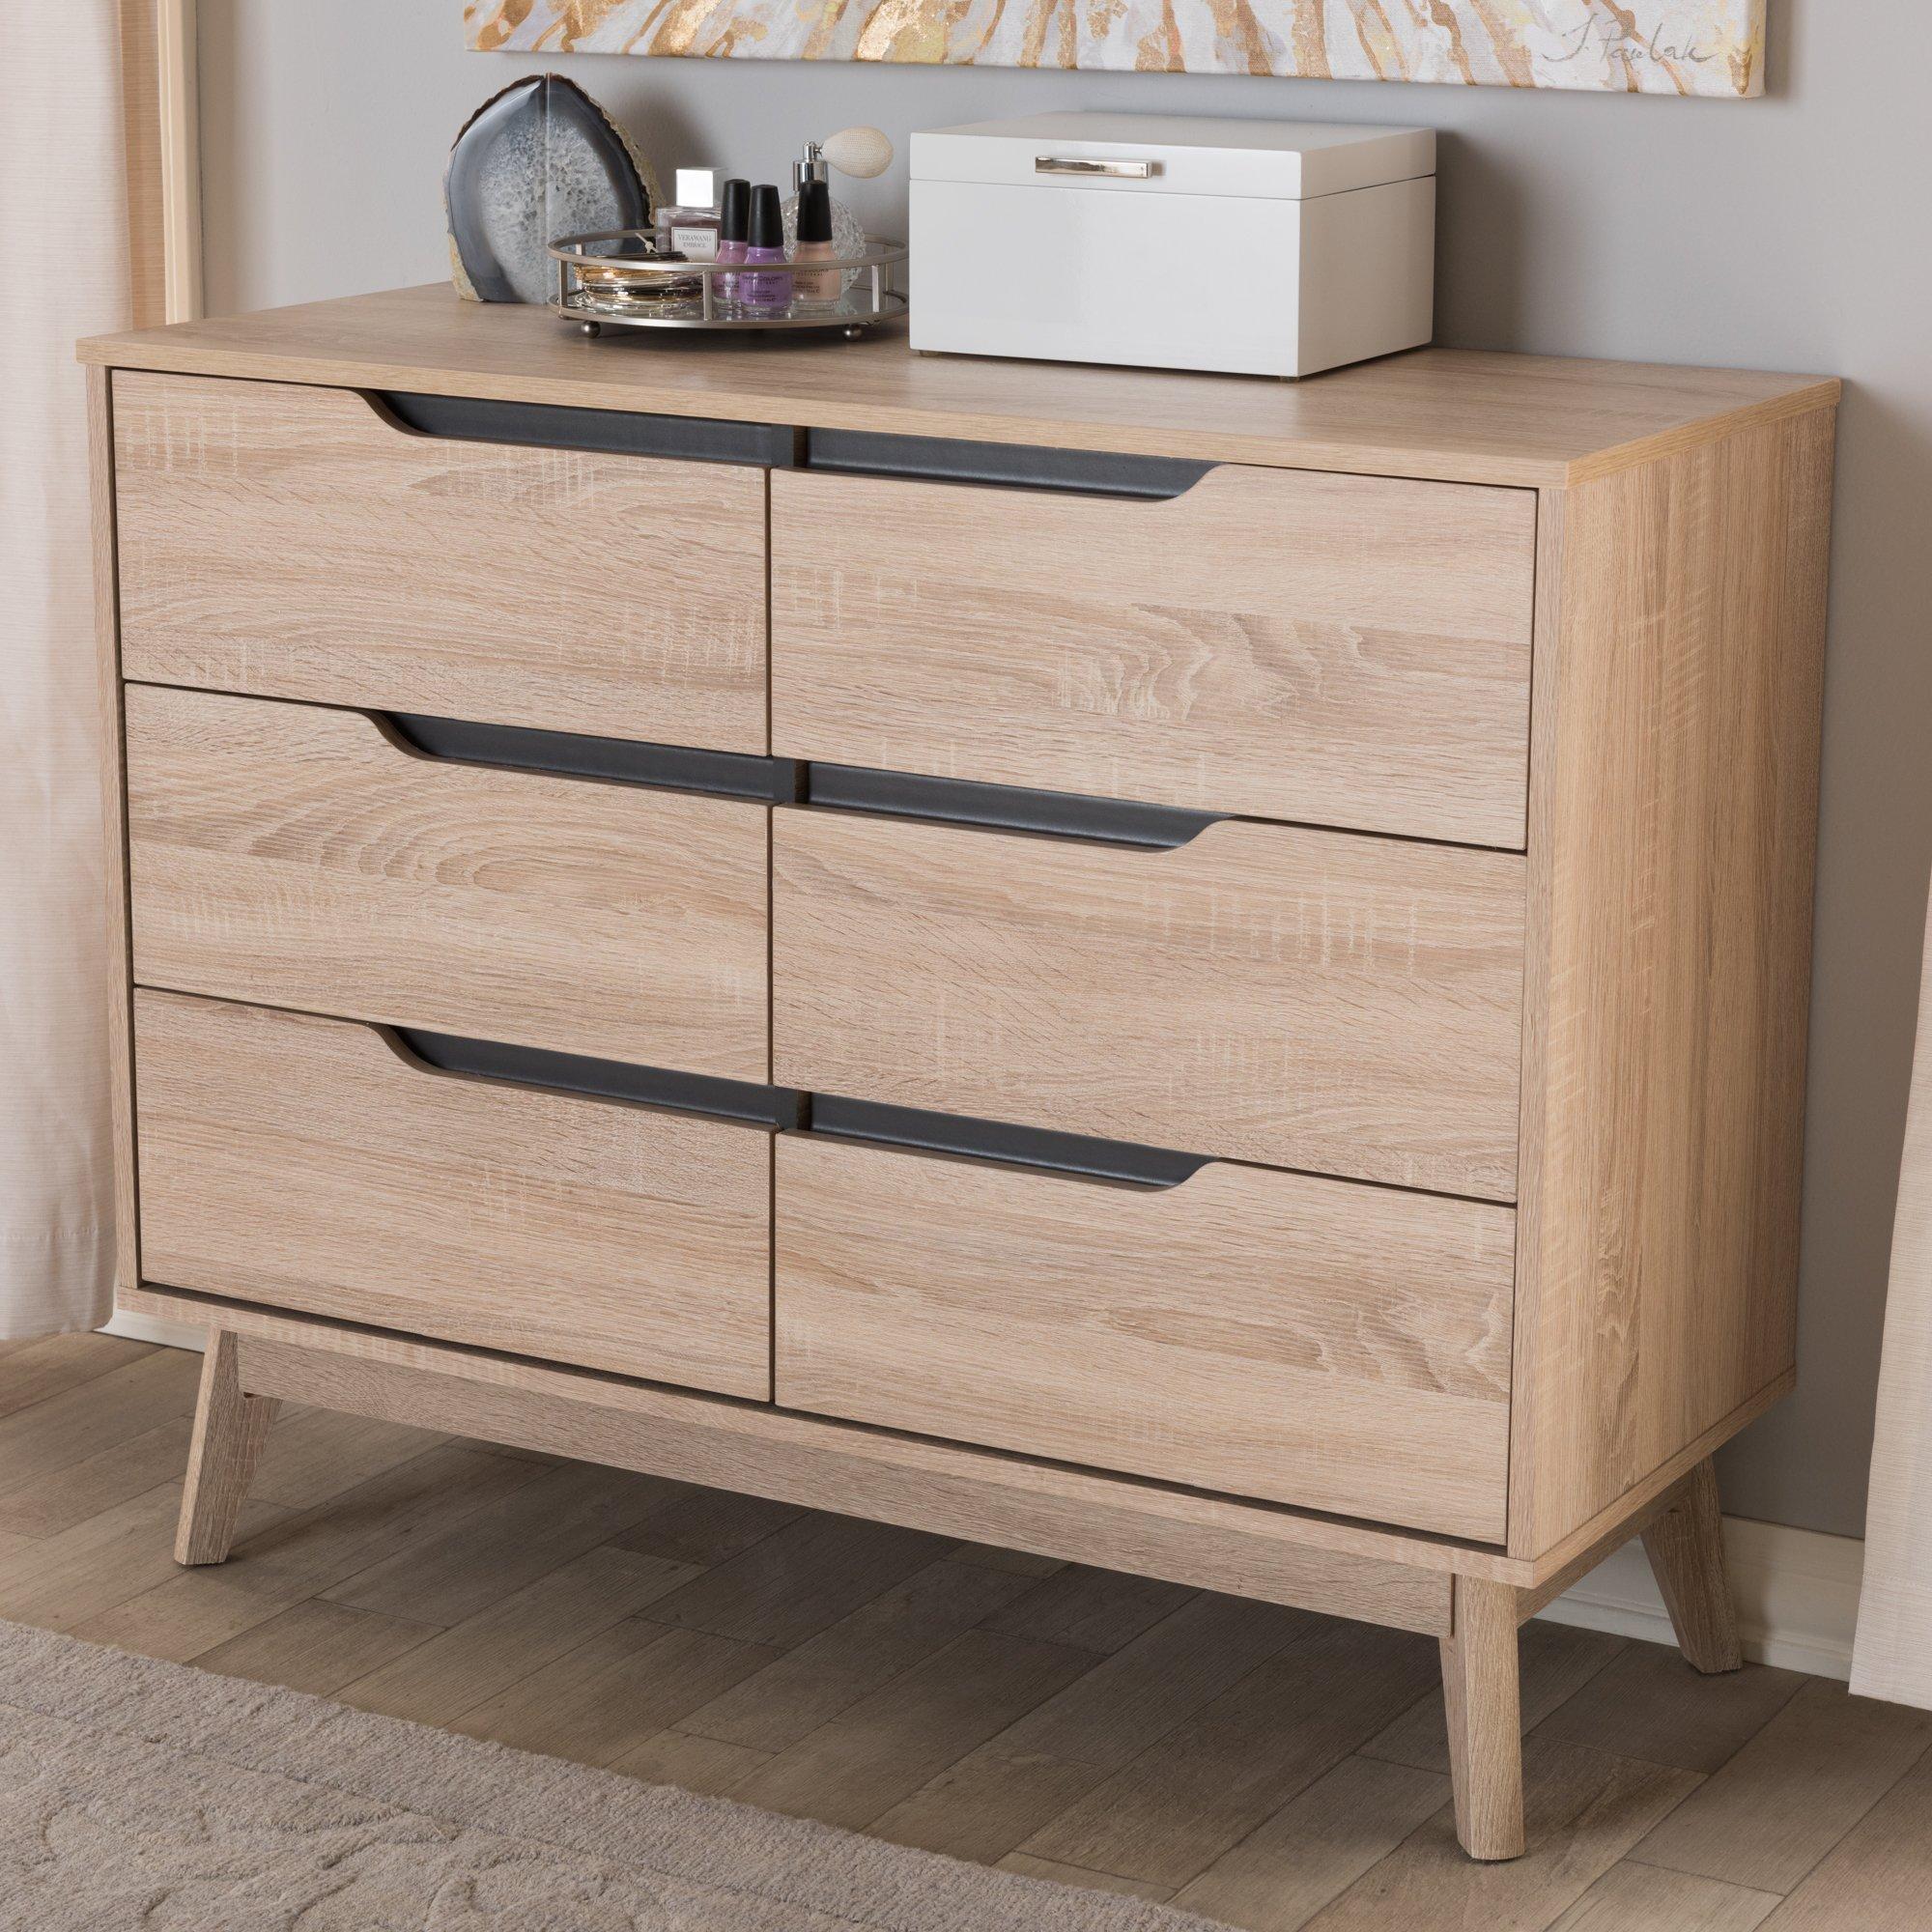 Baxton Studio Fella 6 Drawer Wood Double Dresser In Light